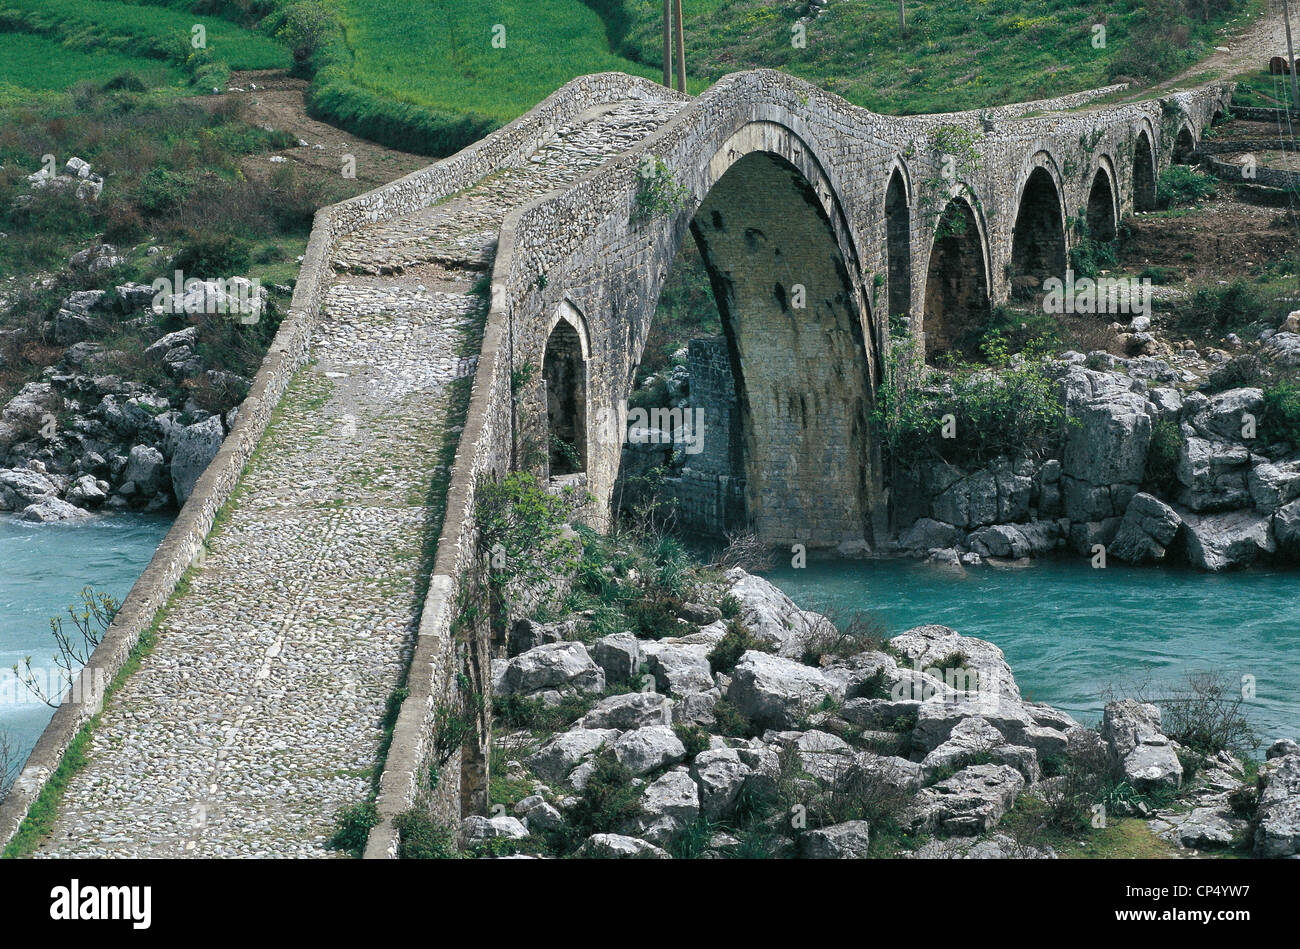 Albania - The Bridge on the River Mes Kiri, near Scutari (Shkodra), turkish style of the eighteenth century. - Stock Image